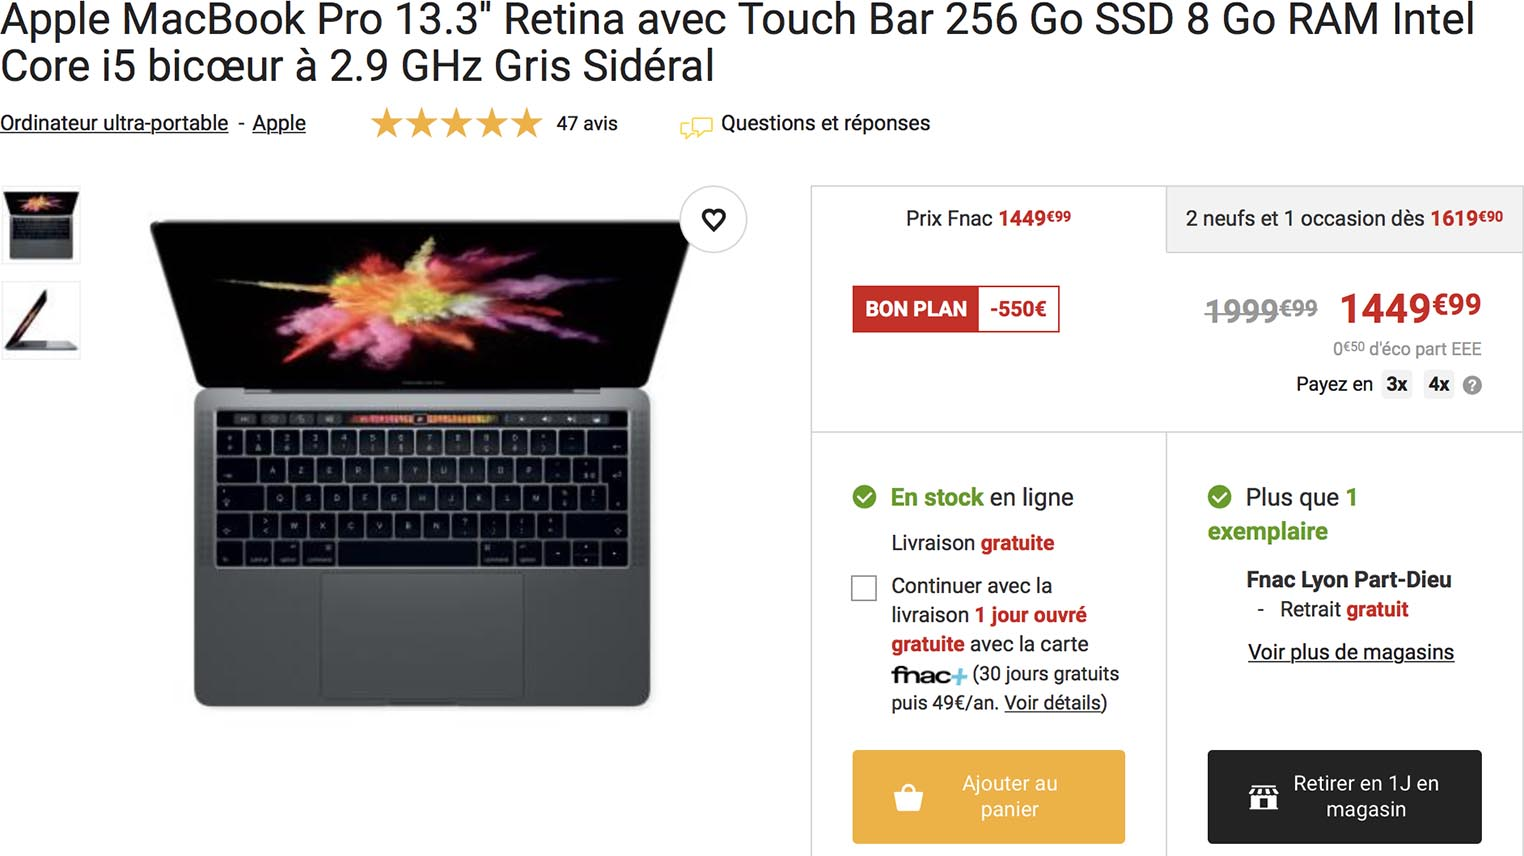 MacBook Pro promo Fnac